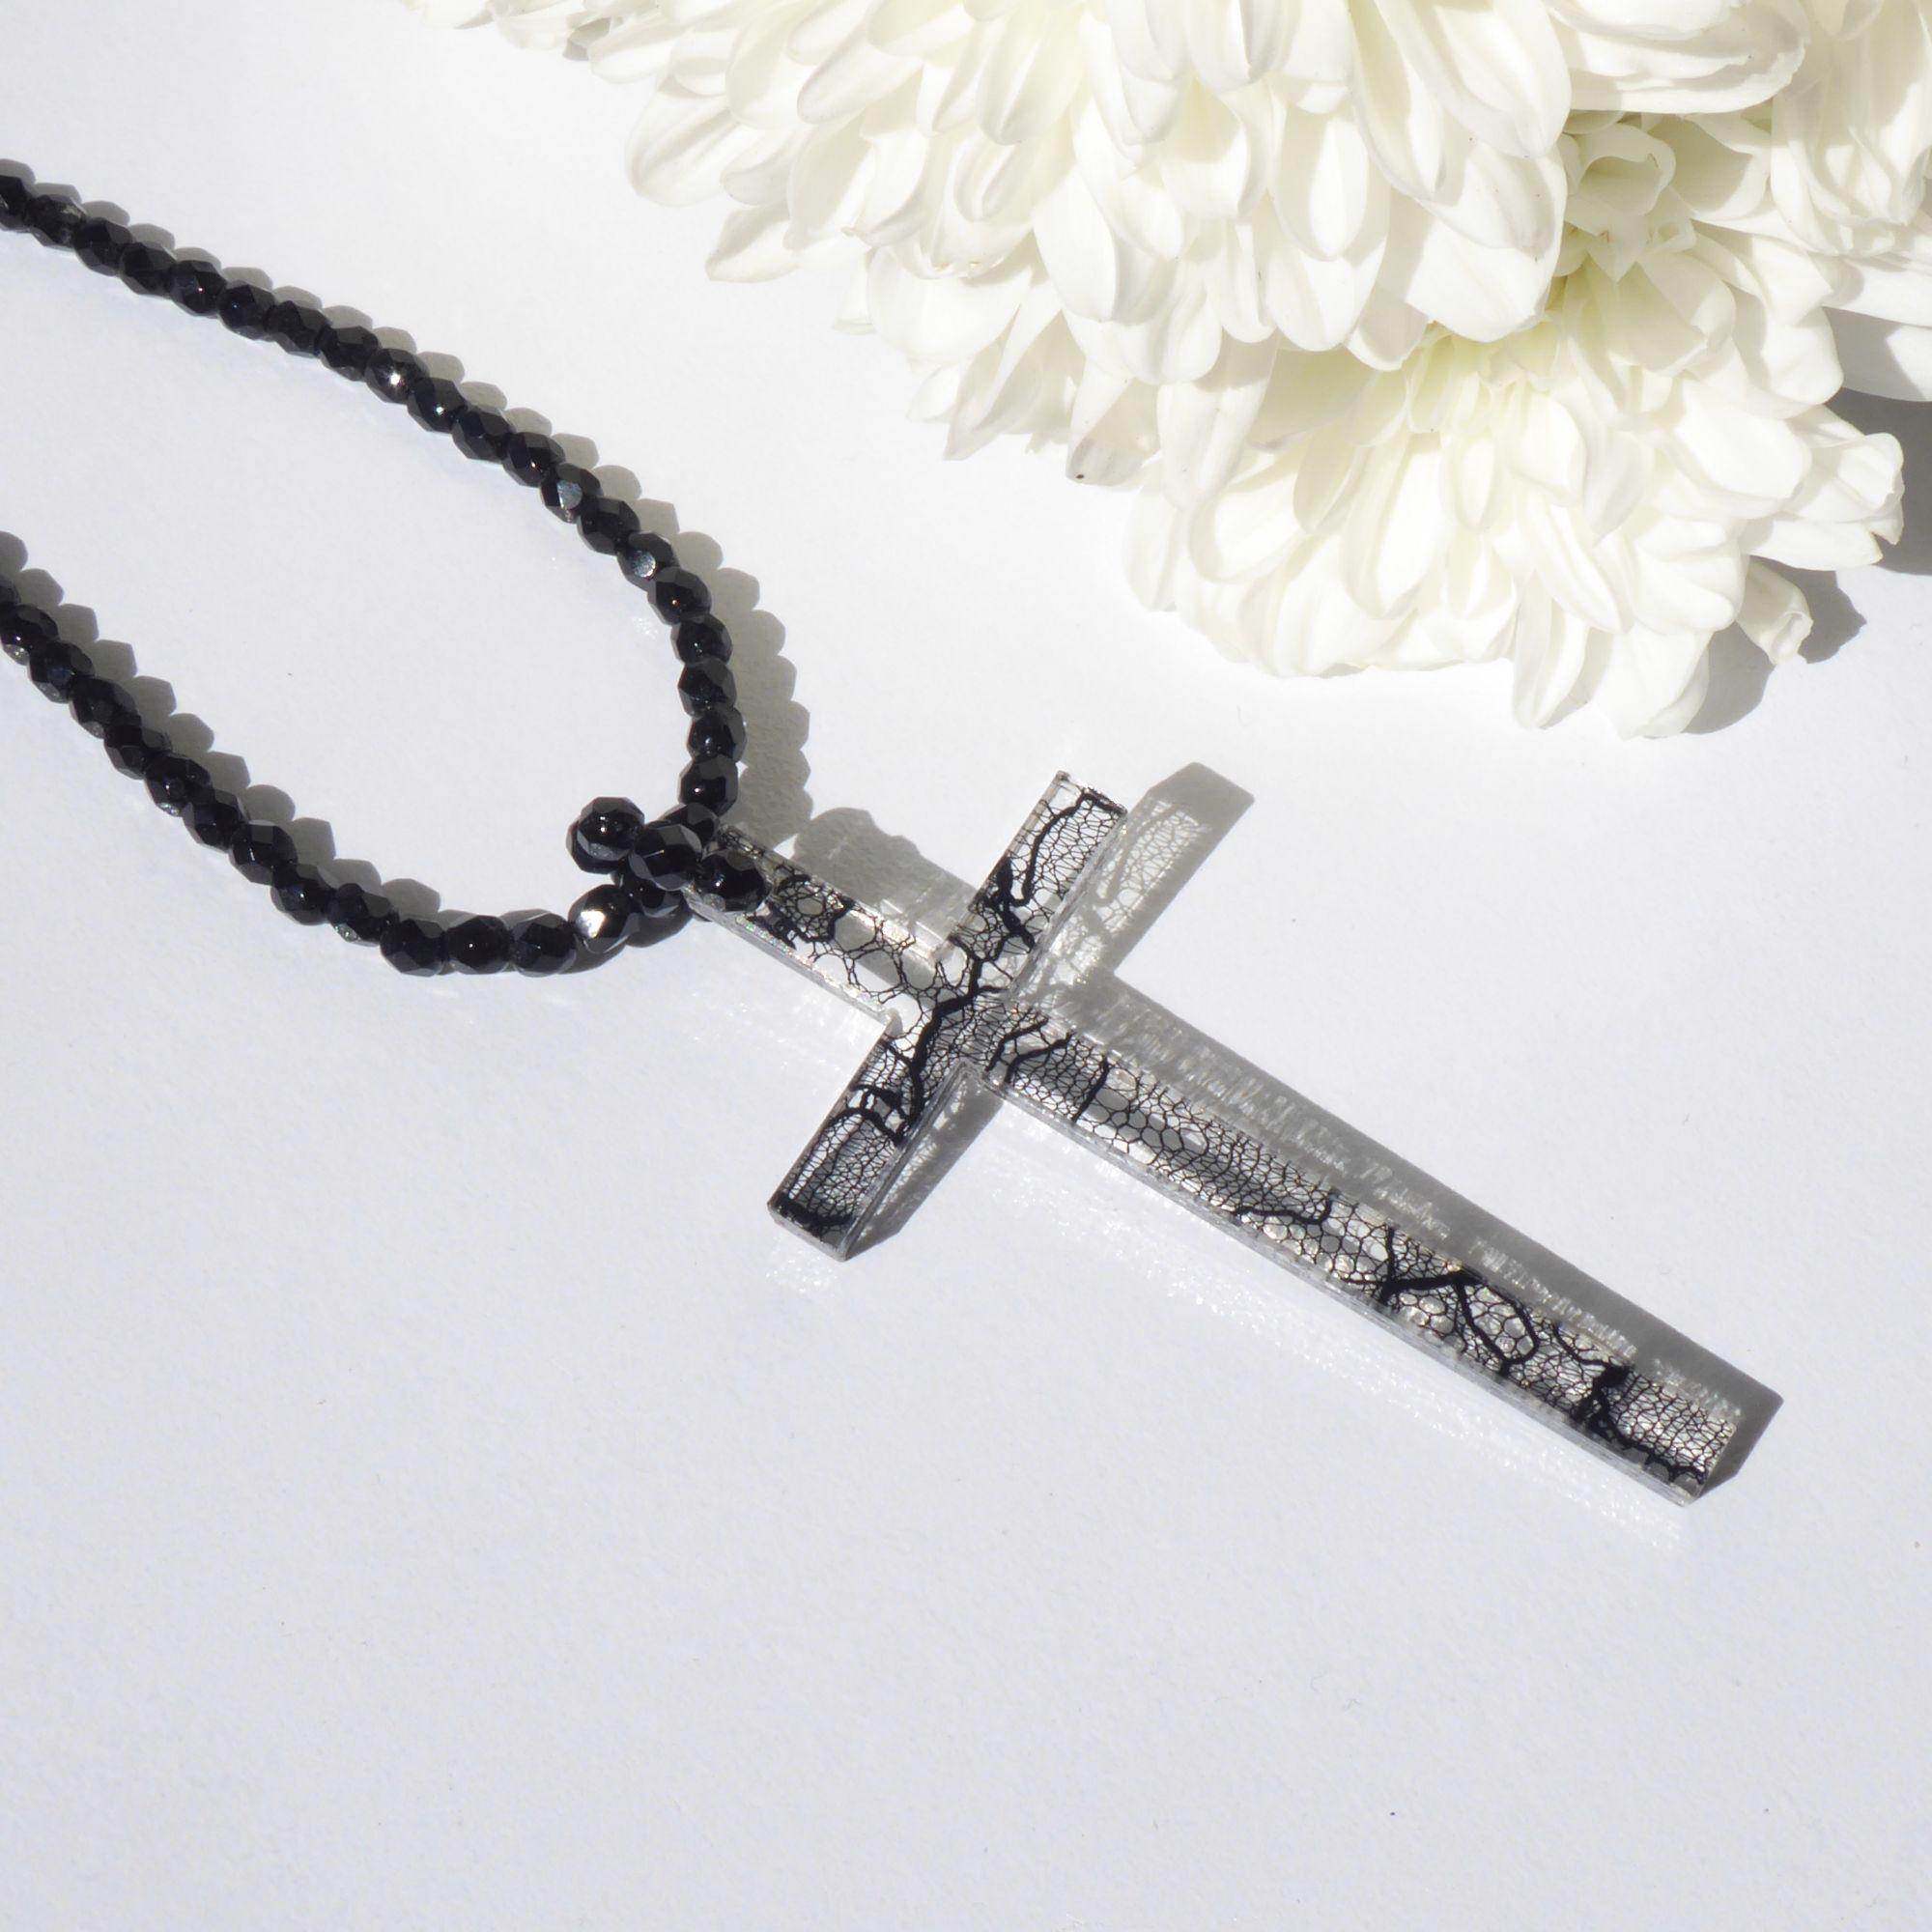 Chantill lace cross